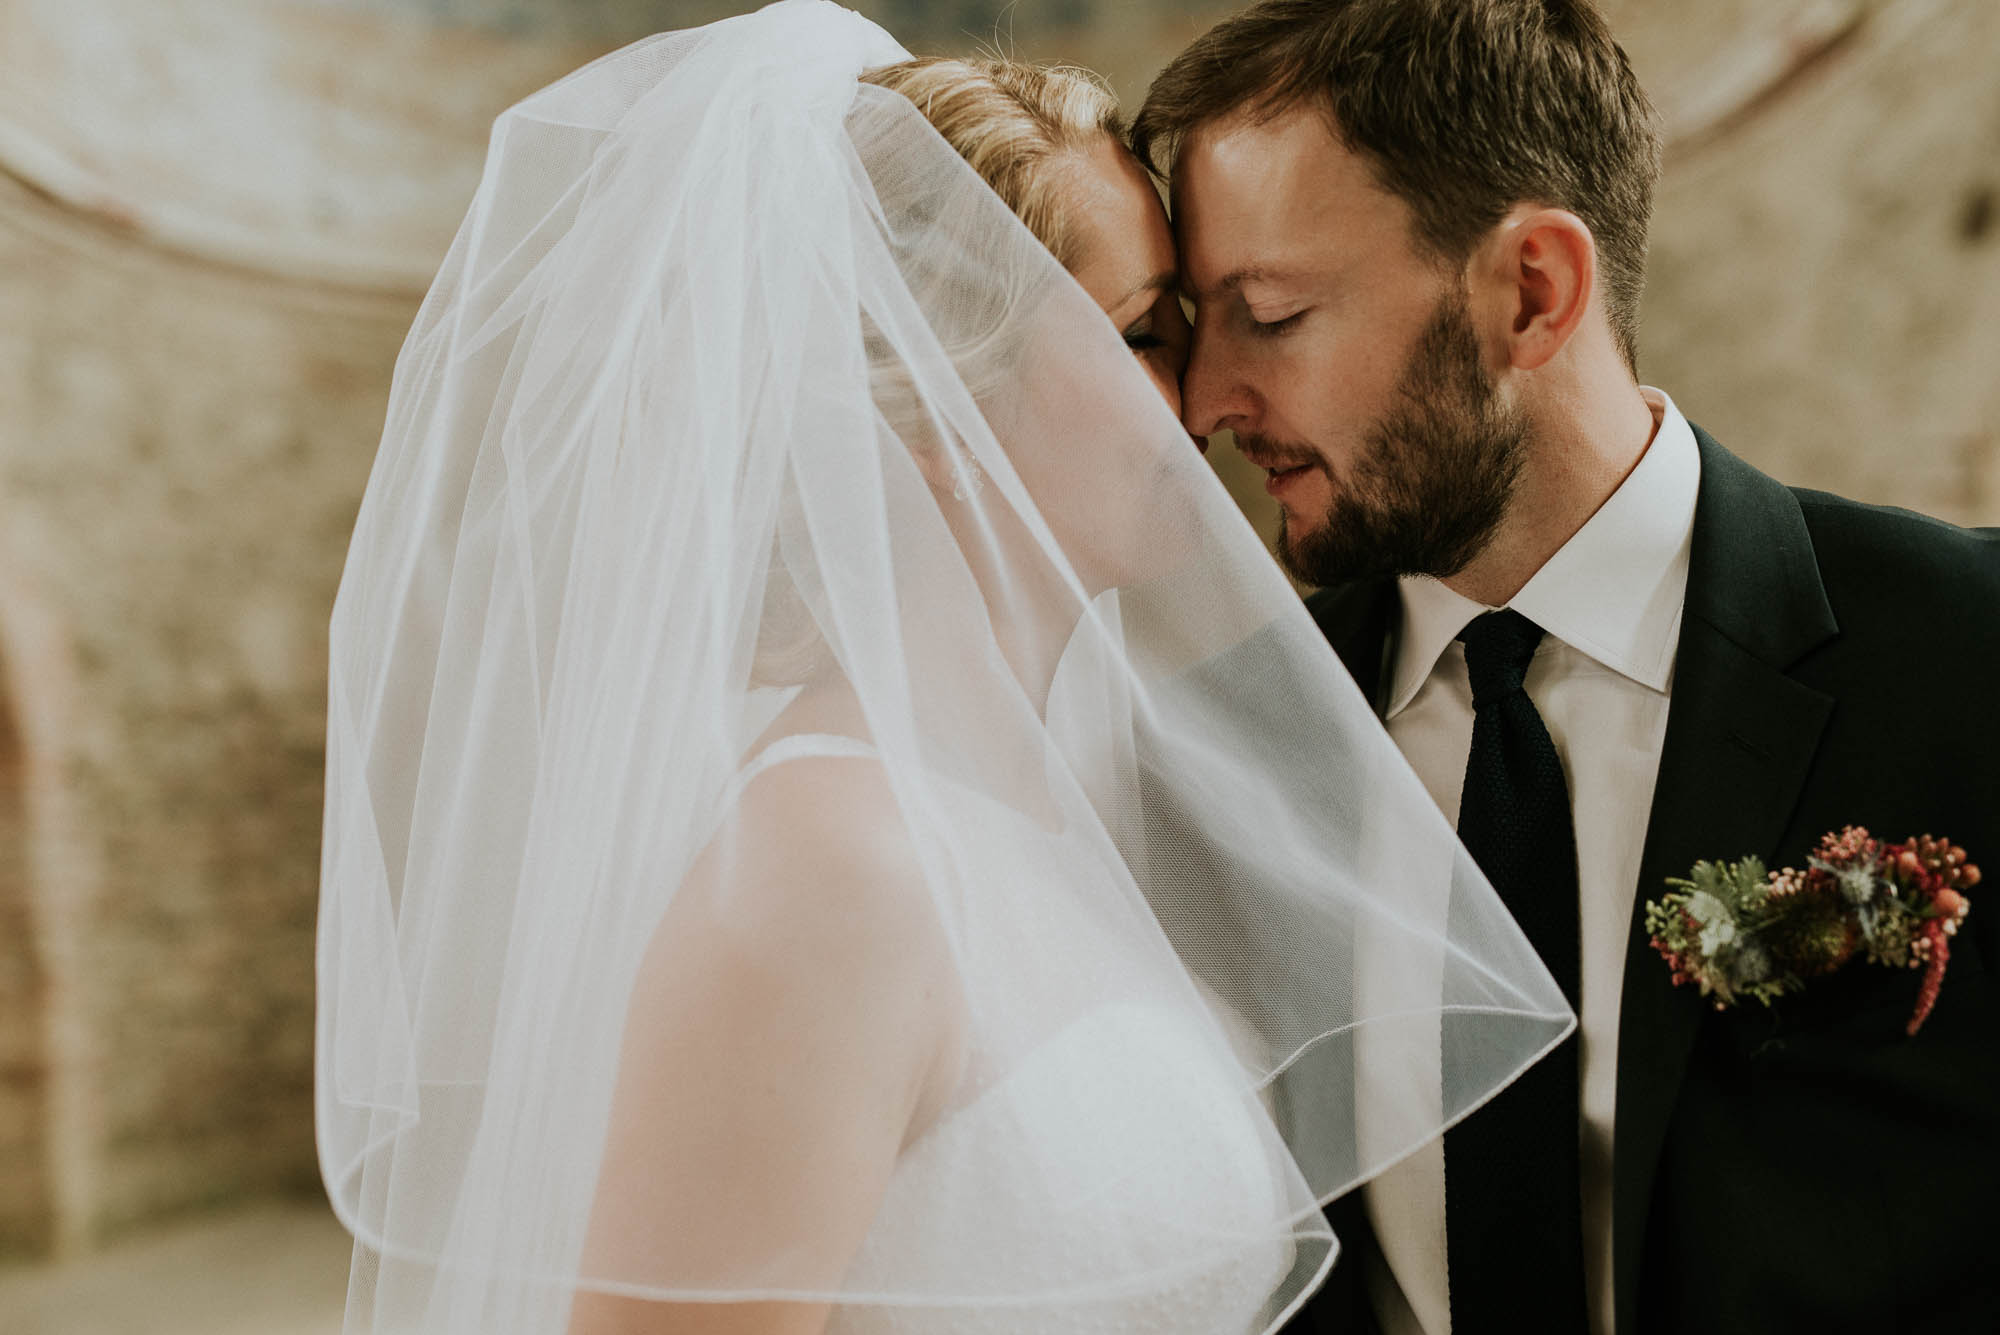 Evča a Pepa/Neratov/Usedlost Hamernice  Nádherná svatba v Orlických horách